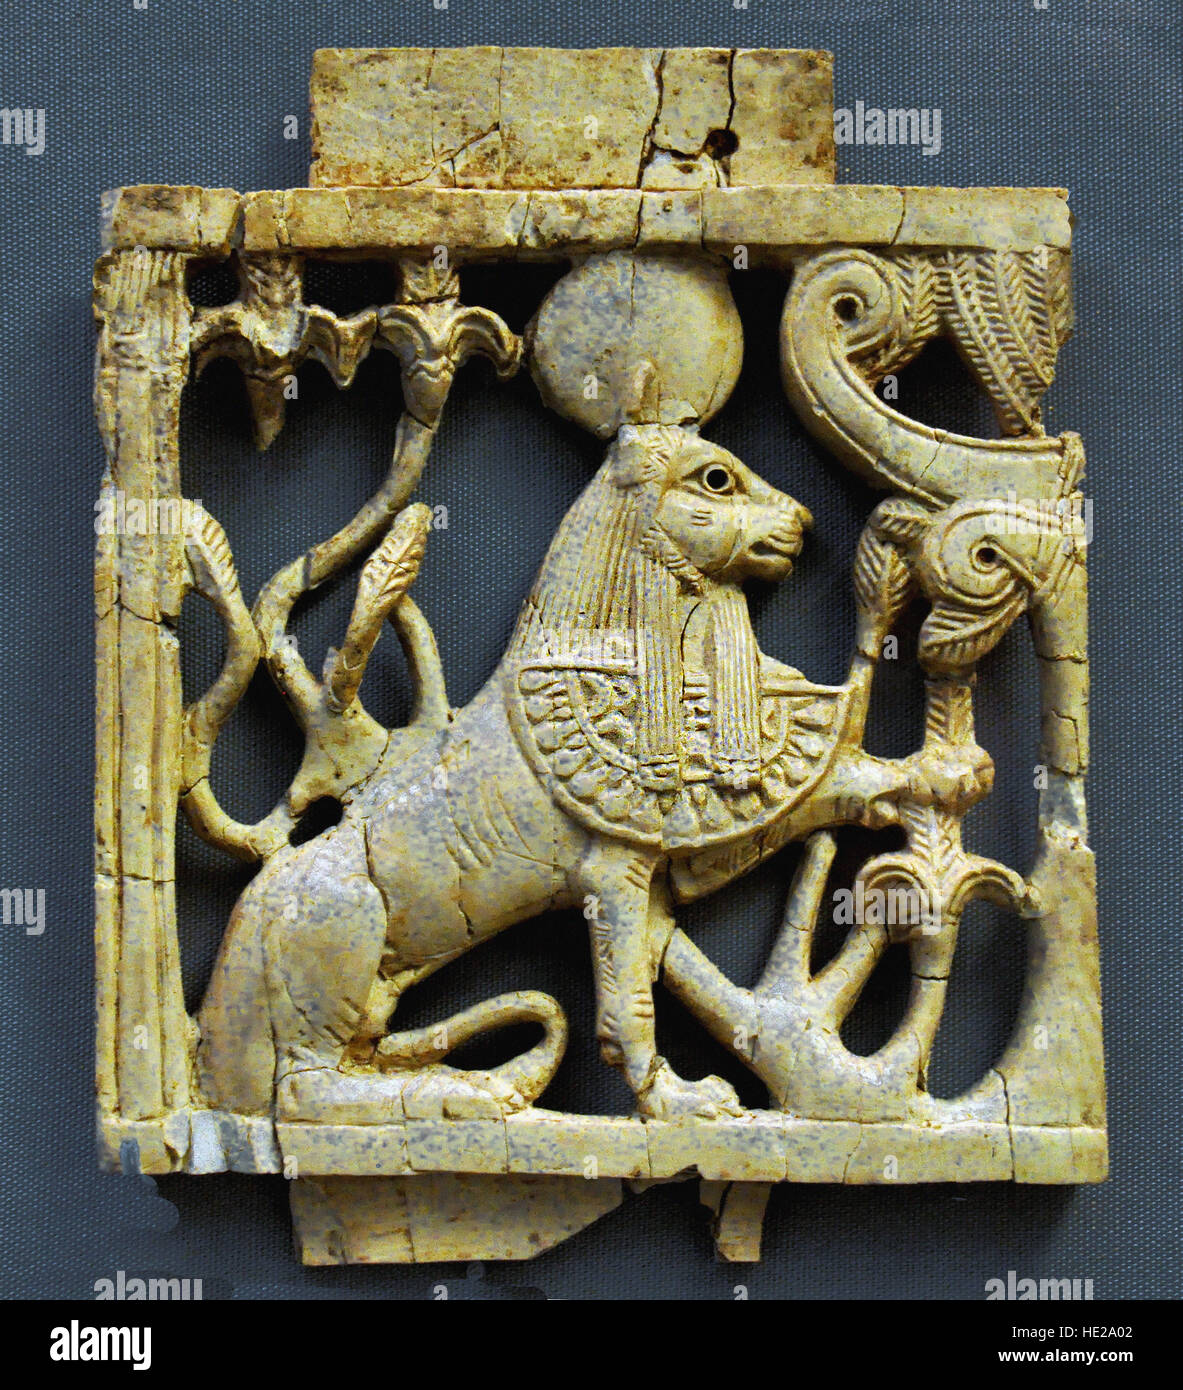 6007. La placca d'Avorio raffigurante una ram intitolata Sphinx. Nimrud, Mesopotamia, 9-8Th. C. BC. Immagini Stock